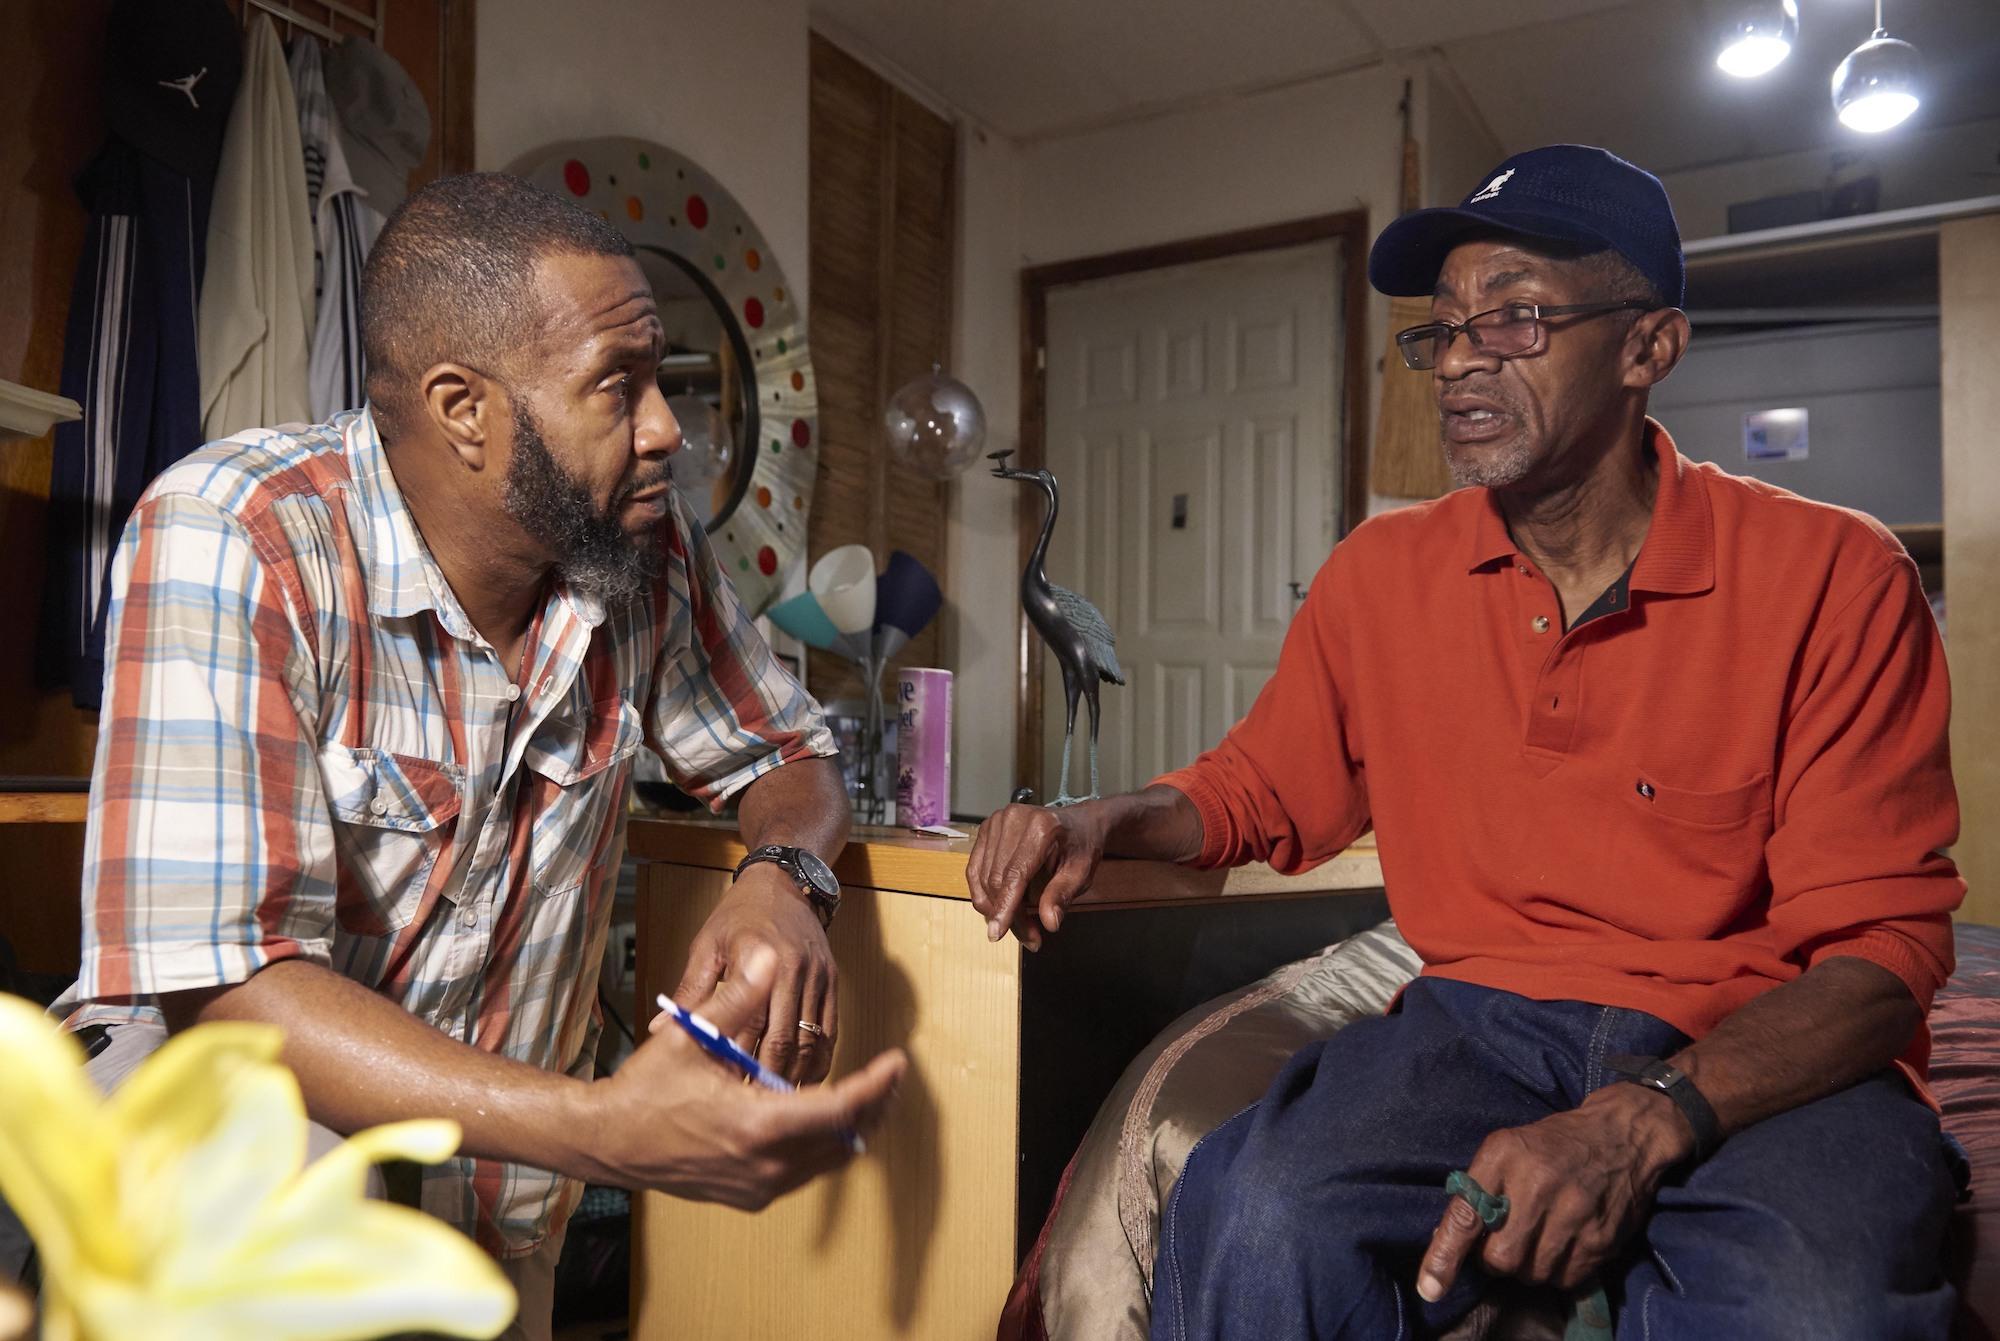 Orson Brown (left) listens to patient Walter Briggs